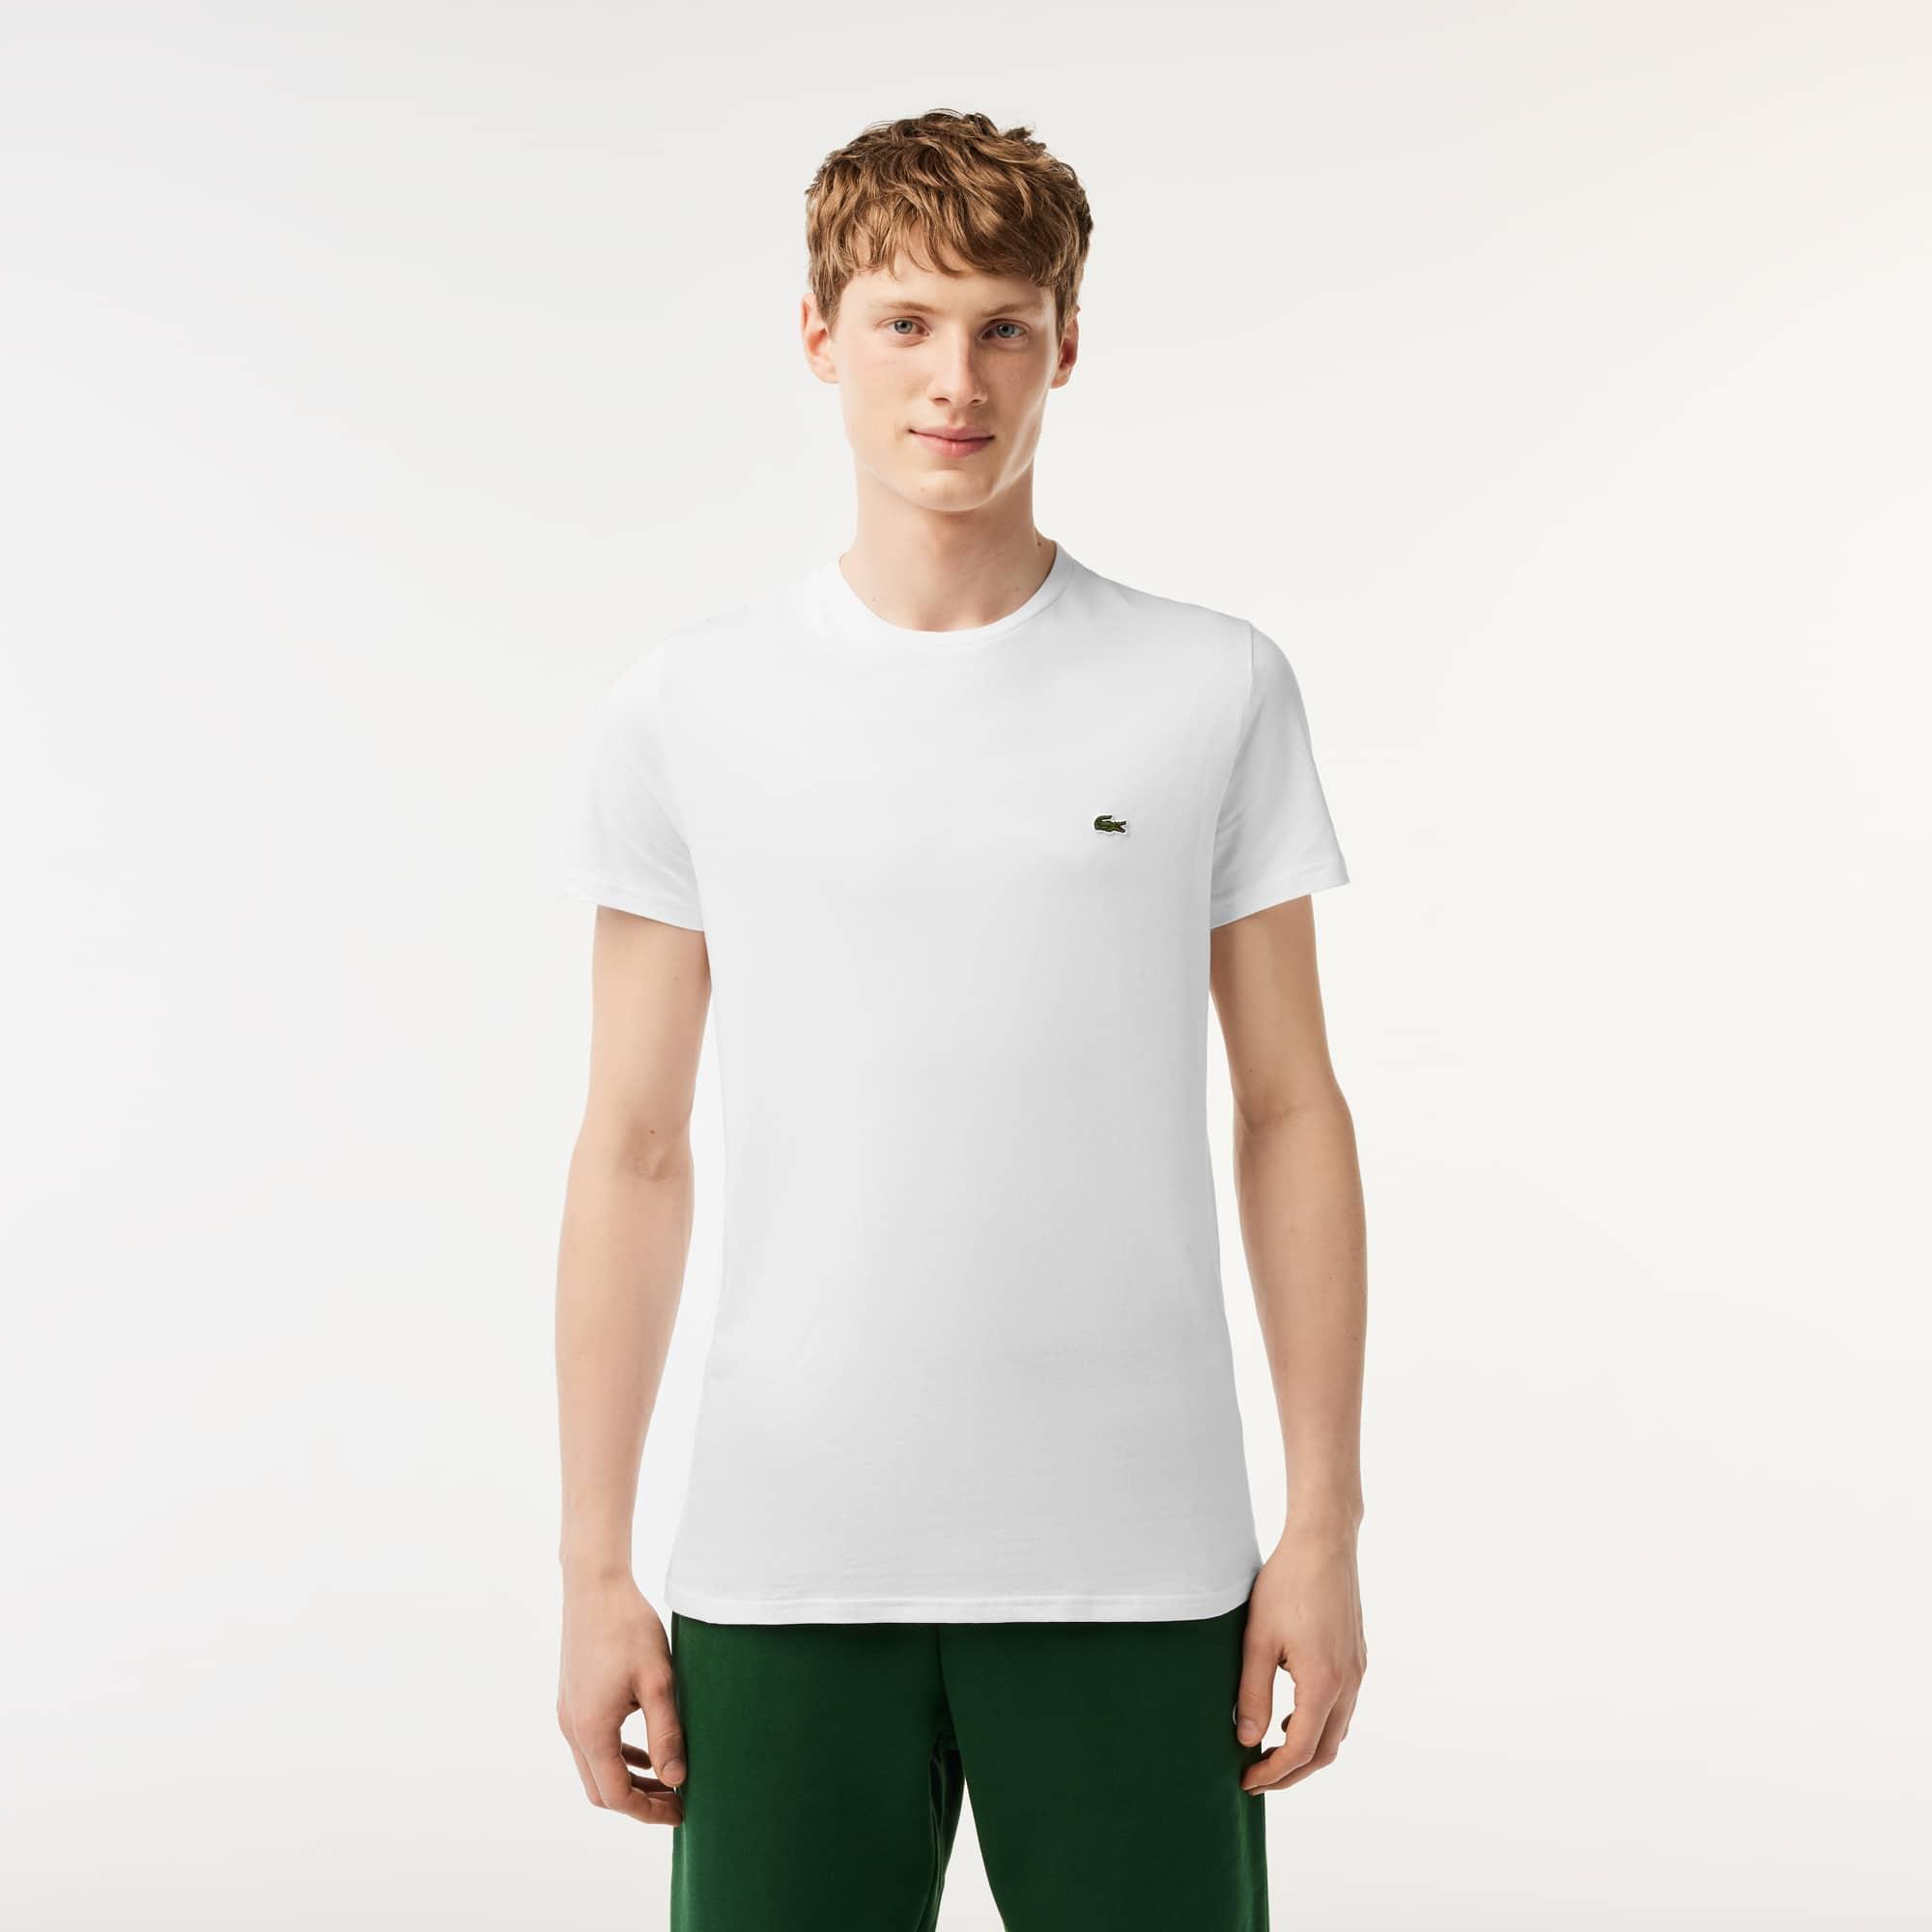 b736cbb3c Men's Clothing | Lacoste Polos, Shirts, Pants and Sportswear